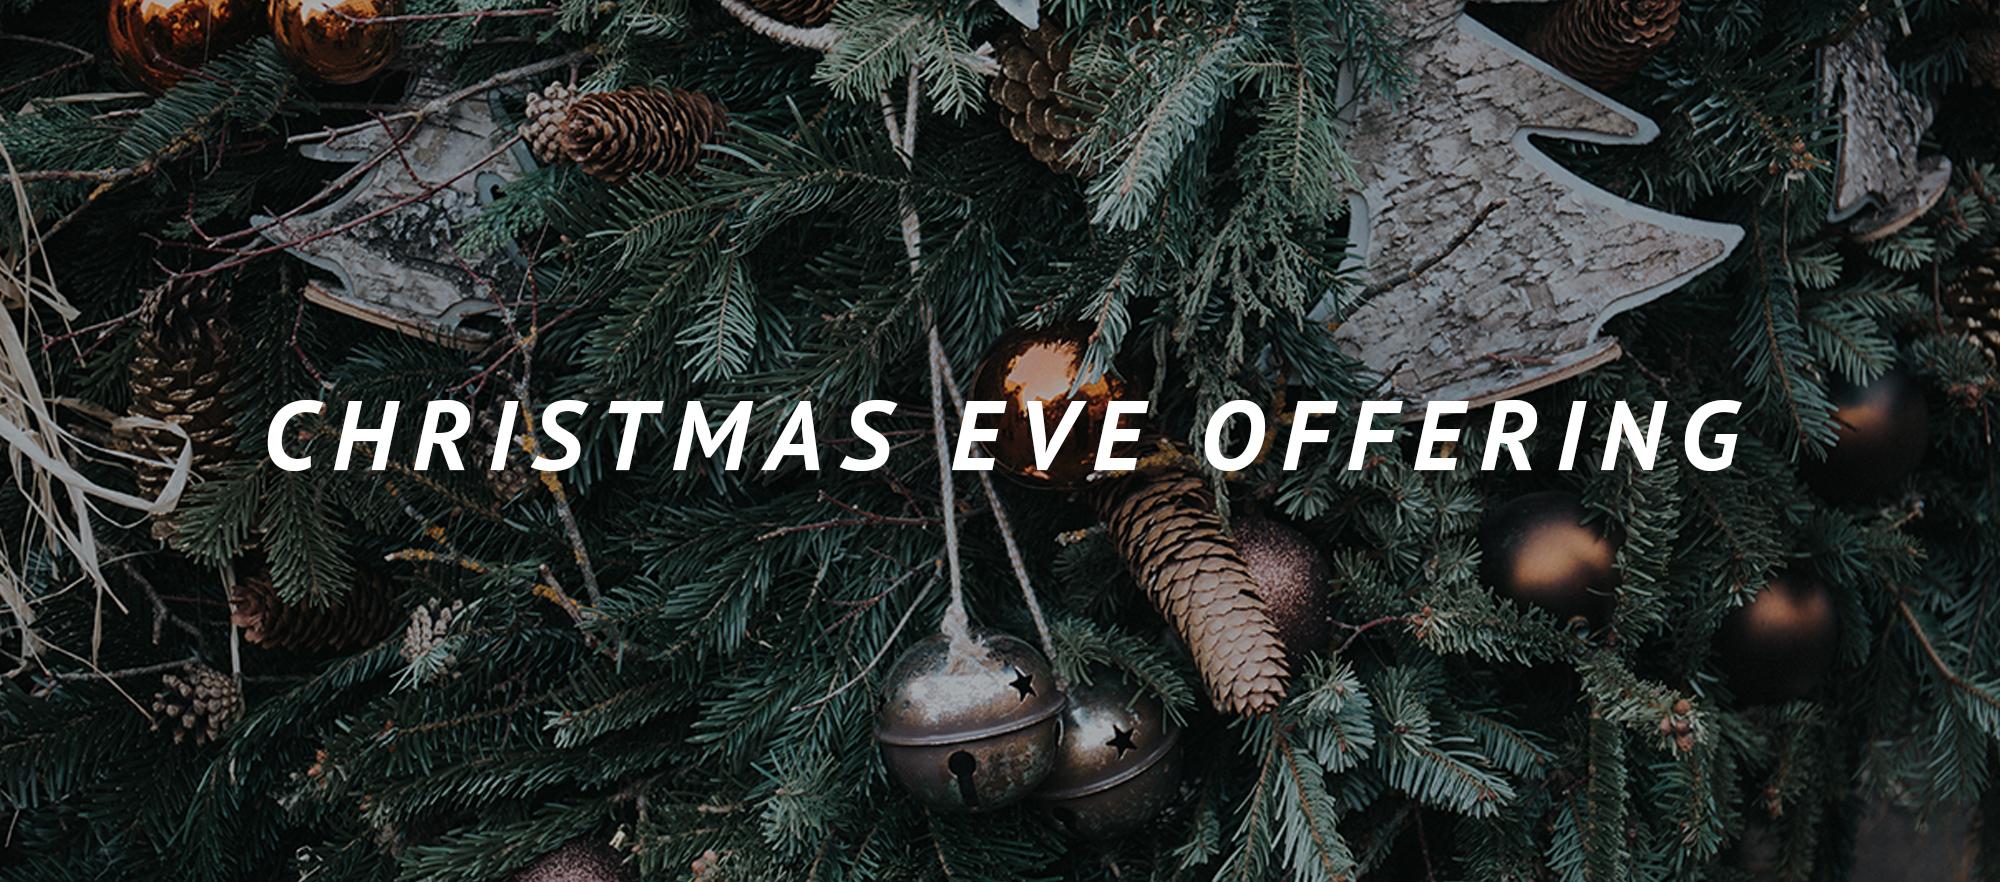 ChristmasEveOffering_blog_header.jpg